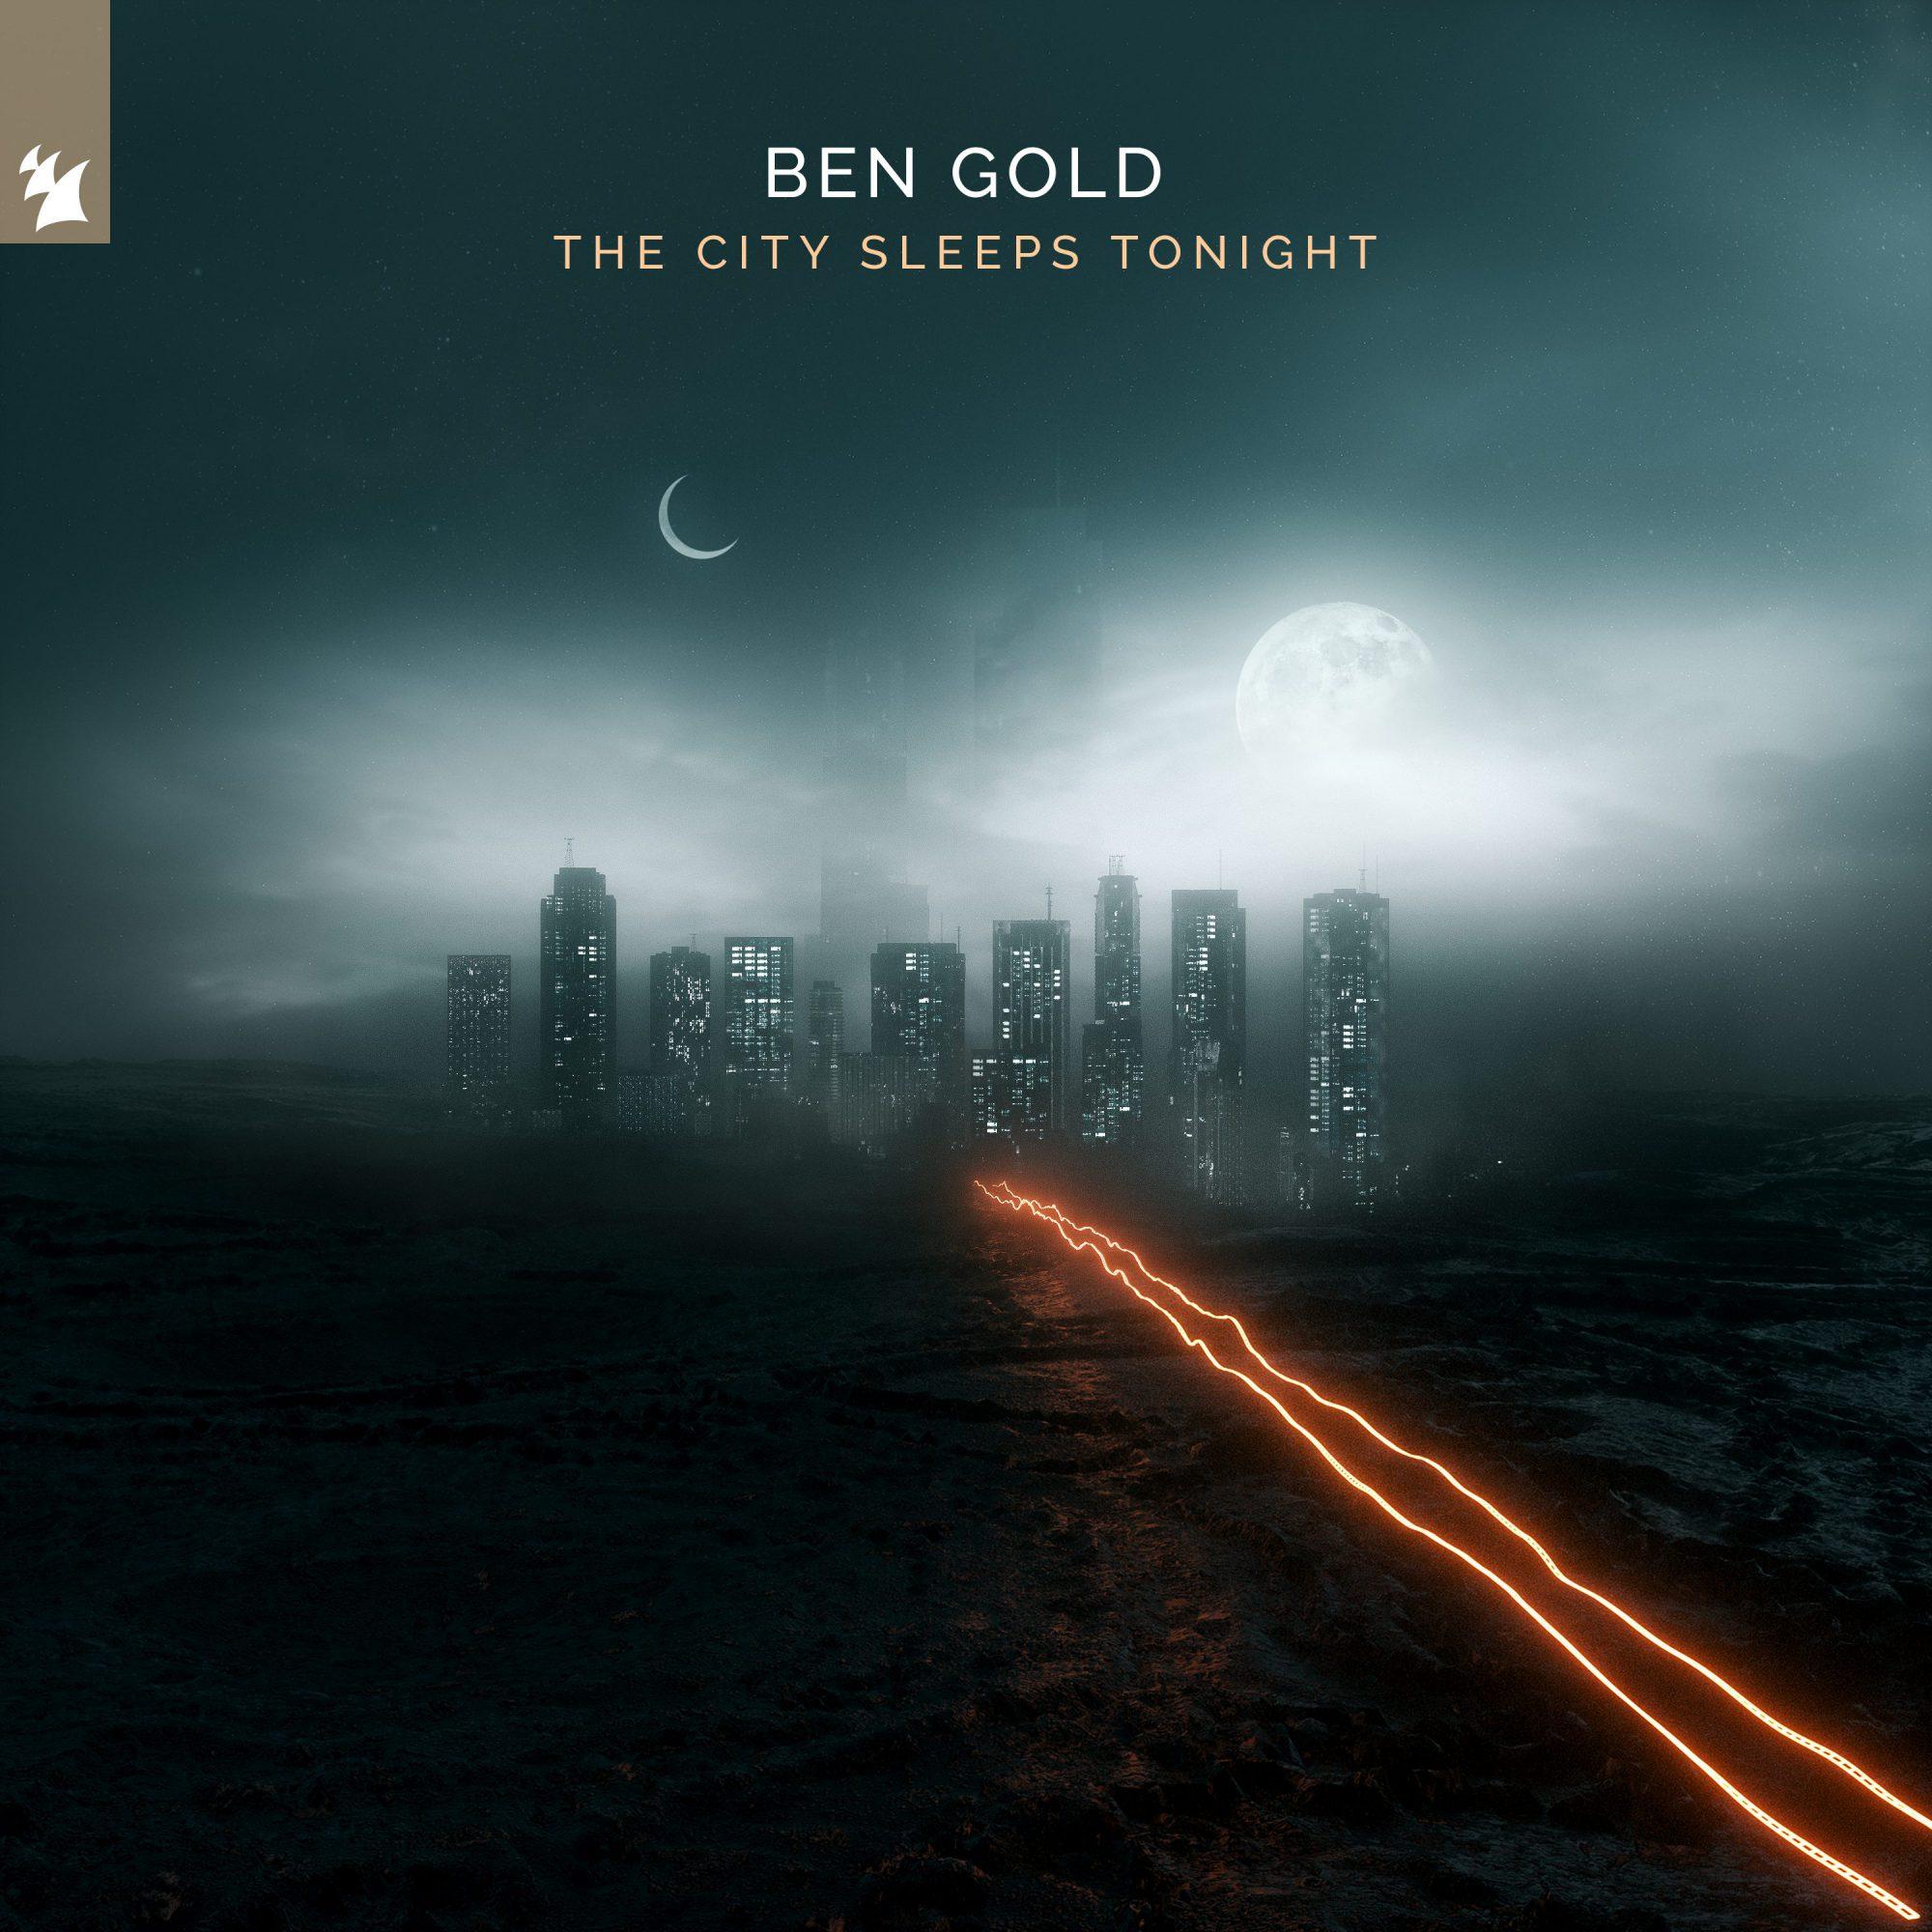 Ben Gold The City Sleeps Tonight Track Photo